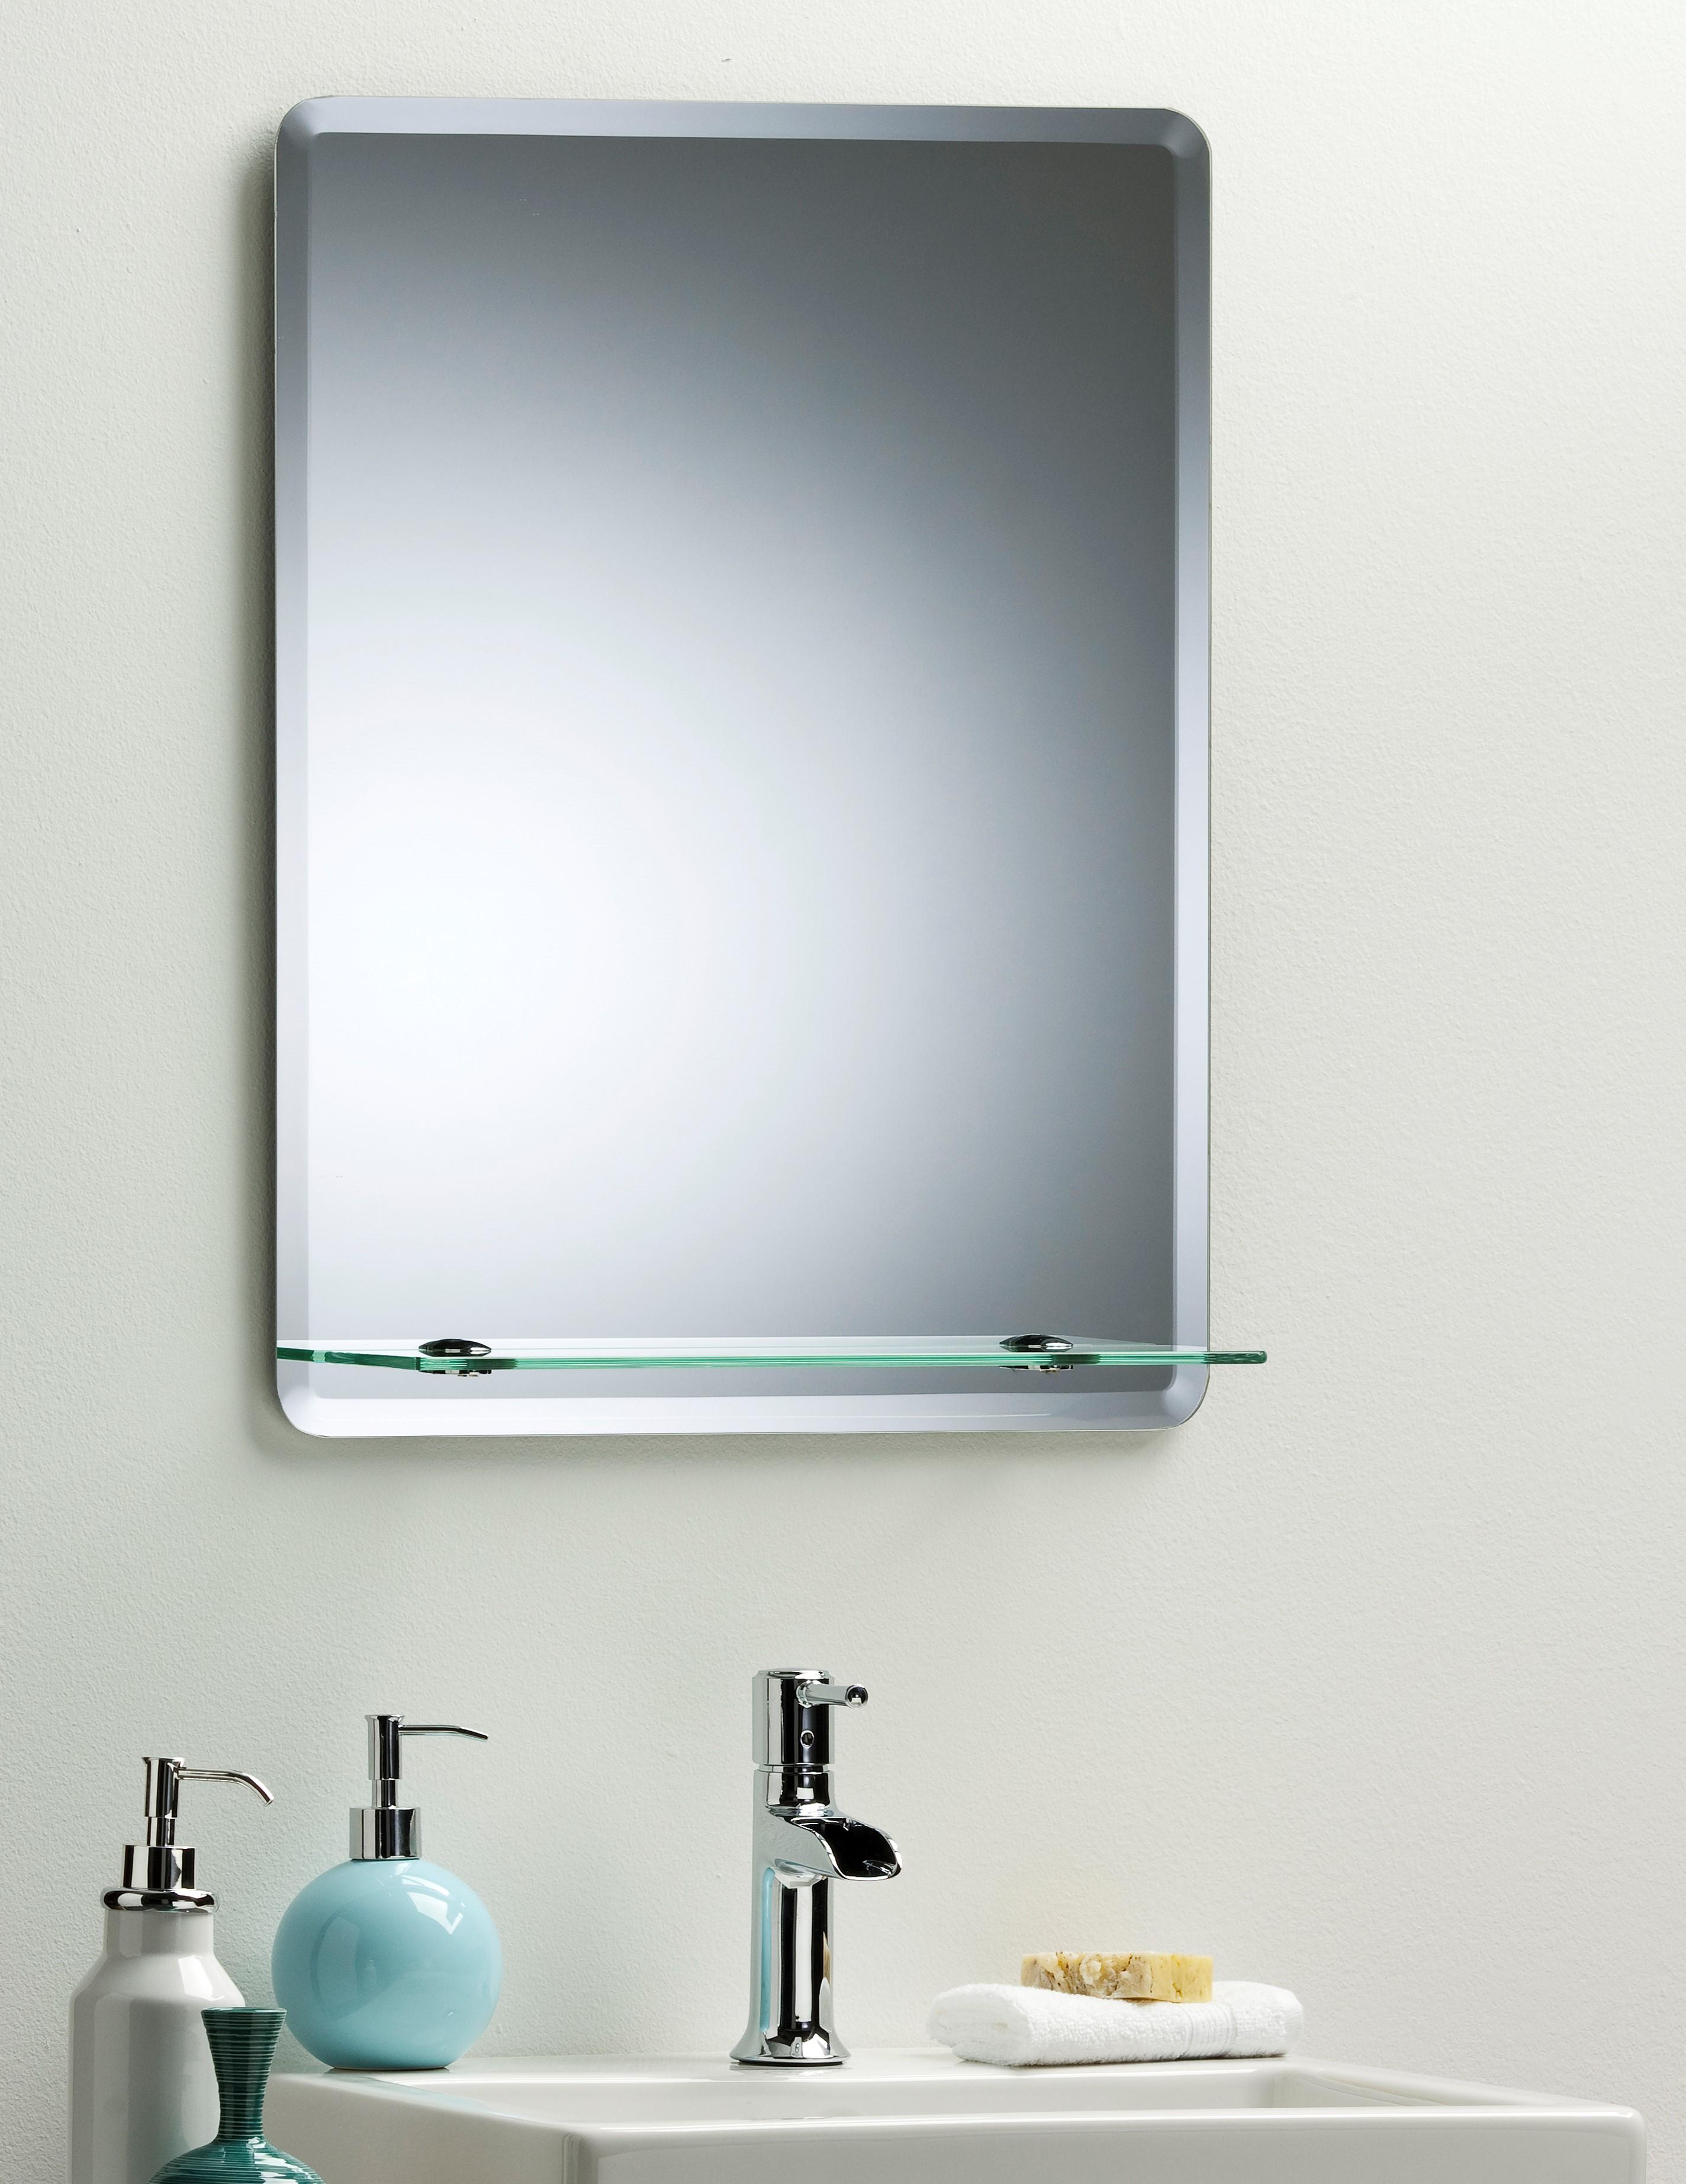 Bathroom mirror with shelf uk - Bathroom Mirror Modern Stylish Rectangular With Shelf Frameless